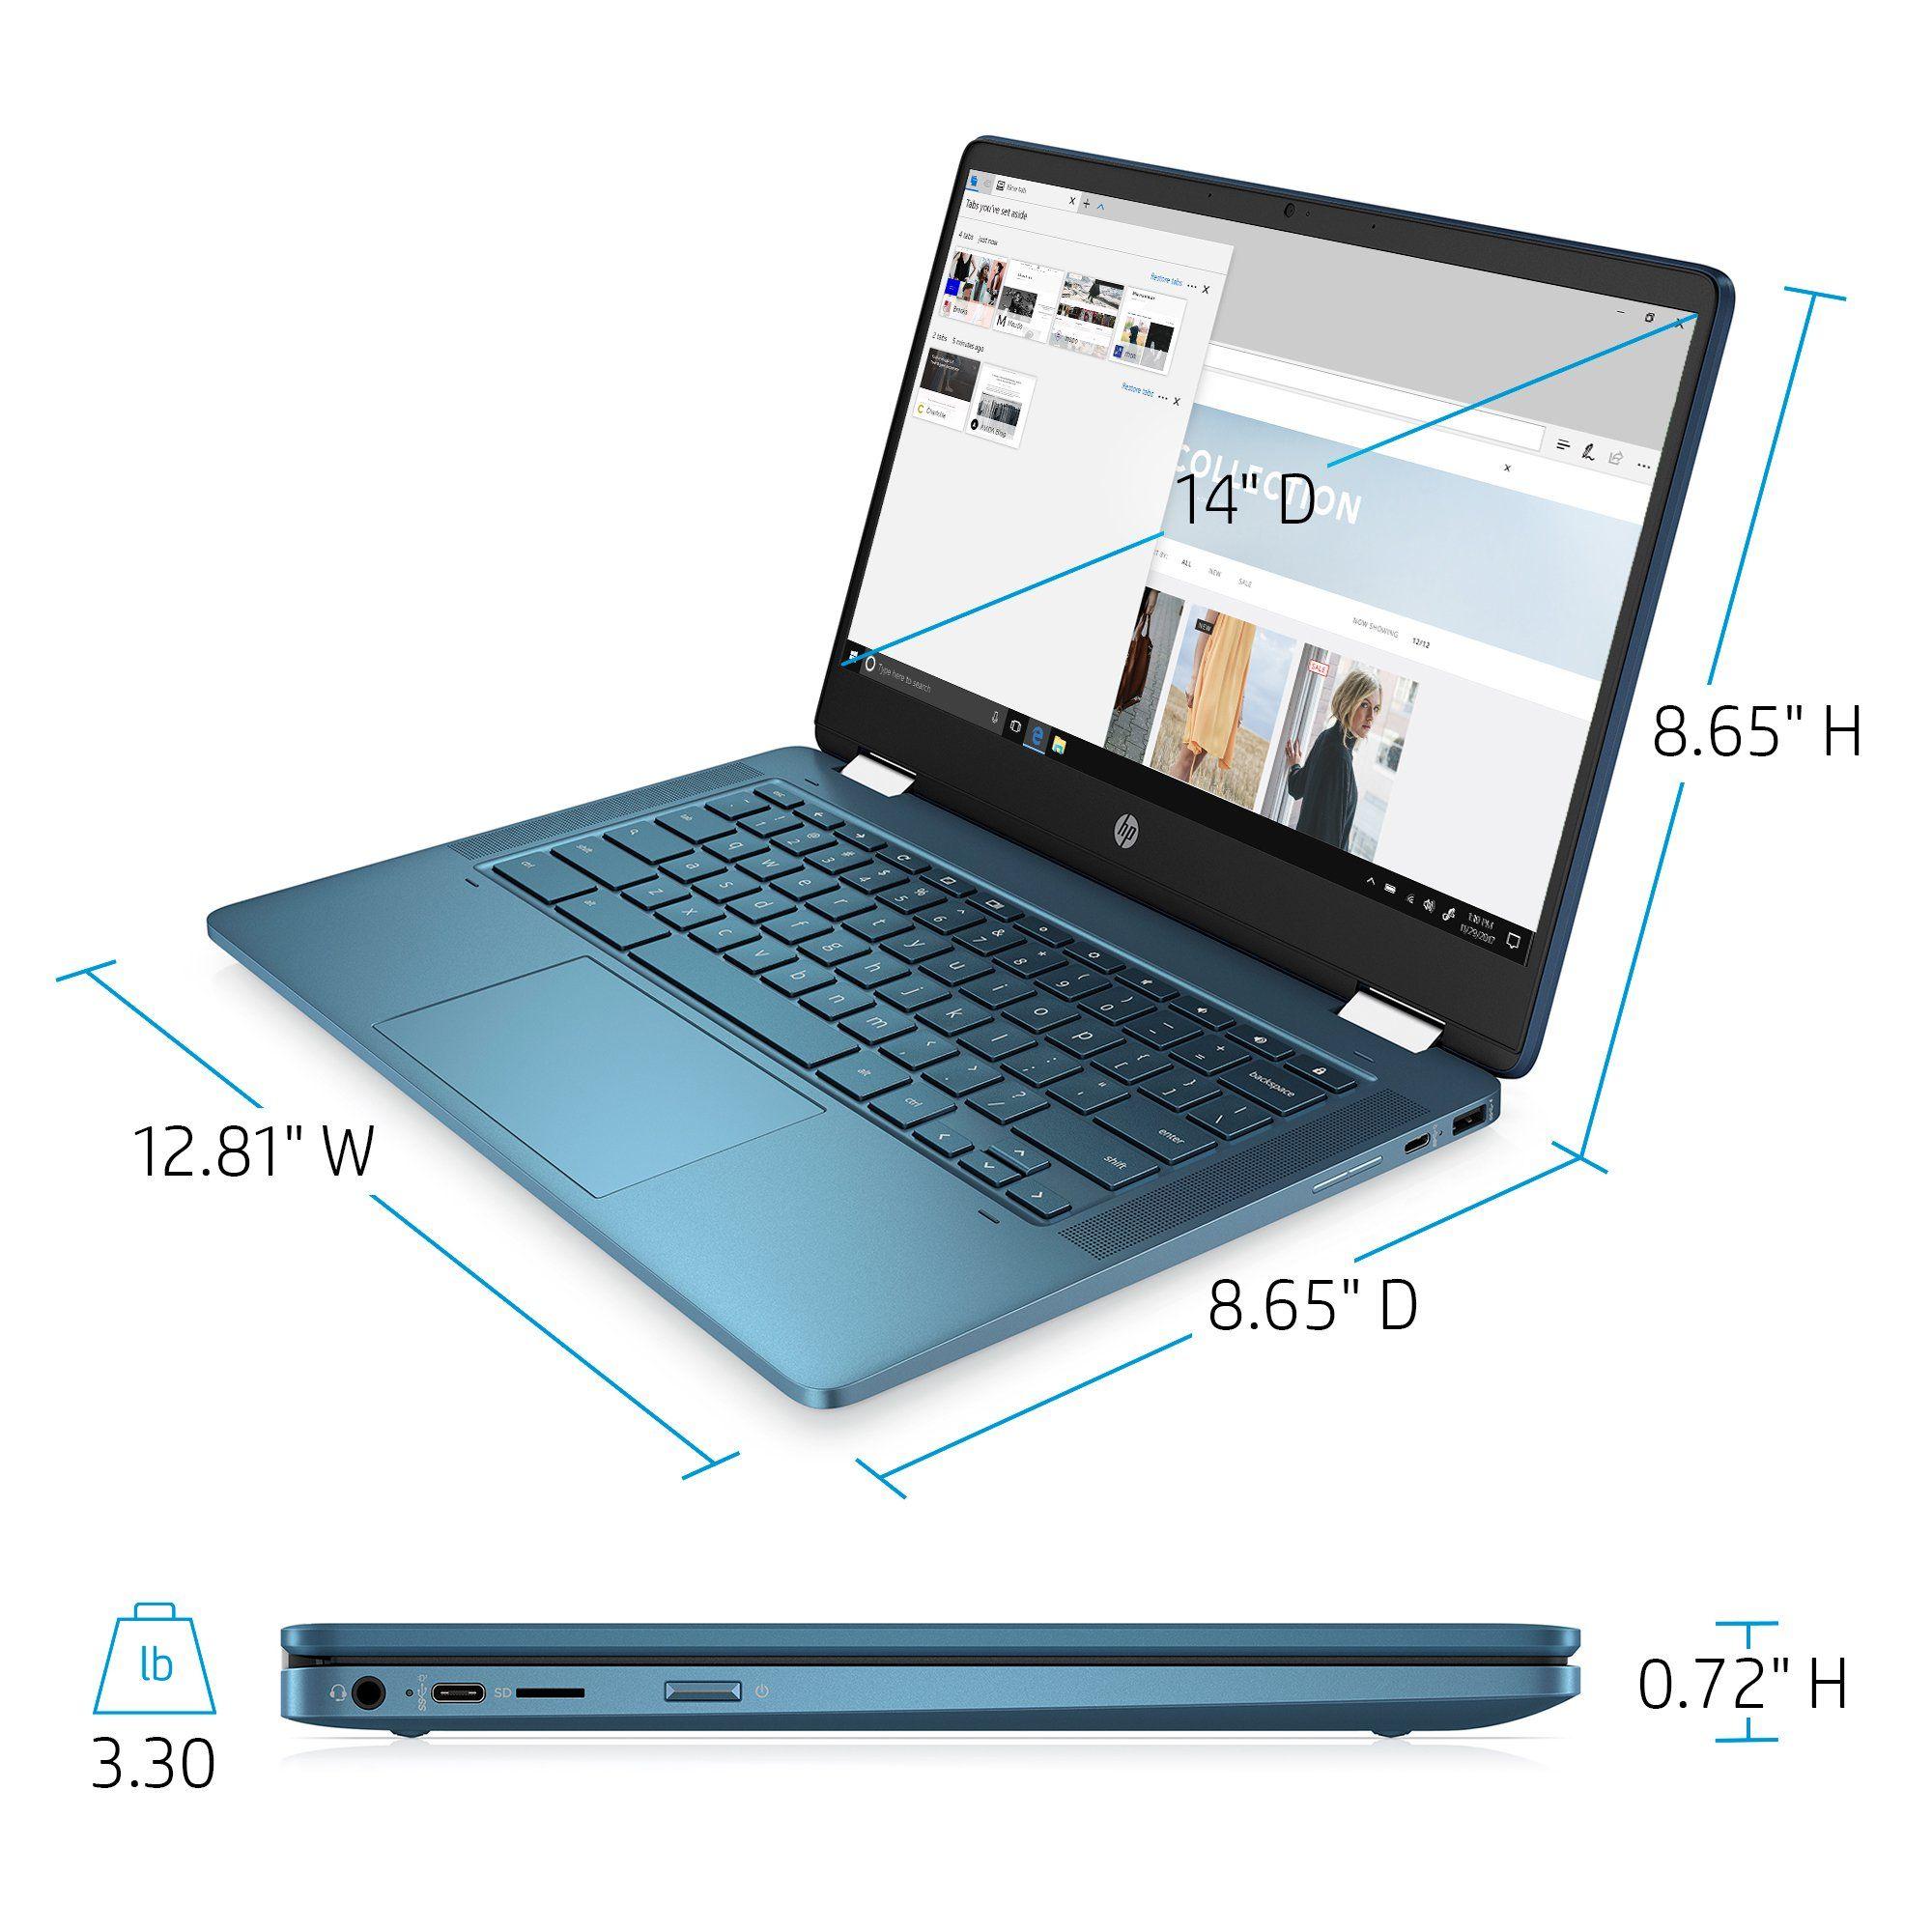 Hp 14 2 In 1 Touch Teal Chromebook Walmart Com In 2021 Chromebook Hp Chromebook Intel